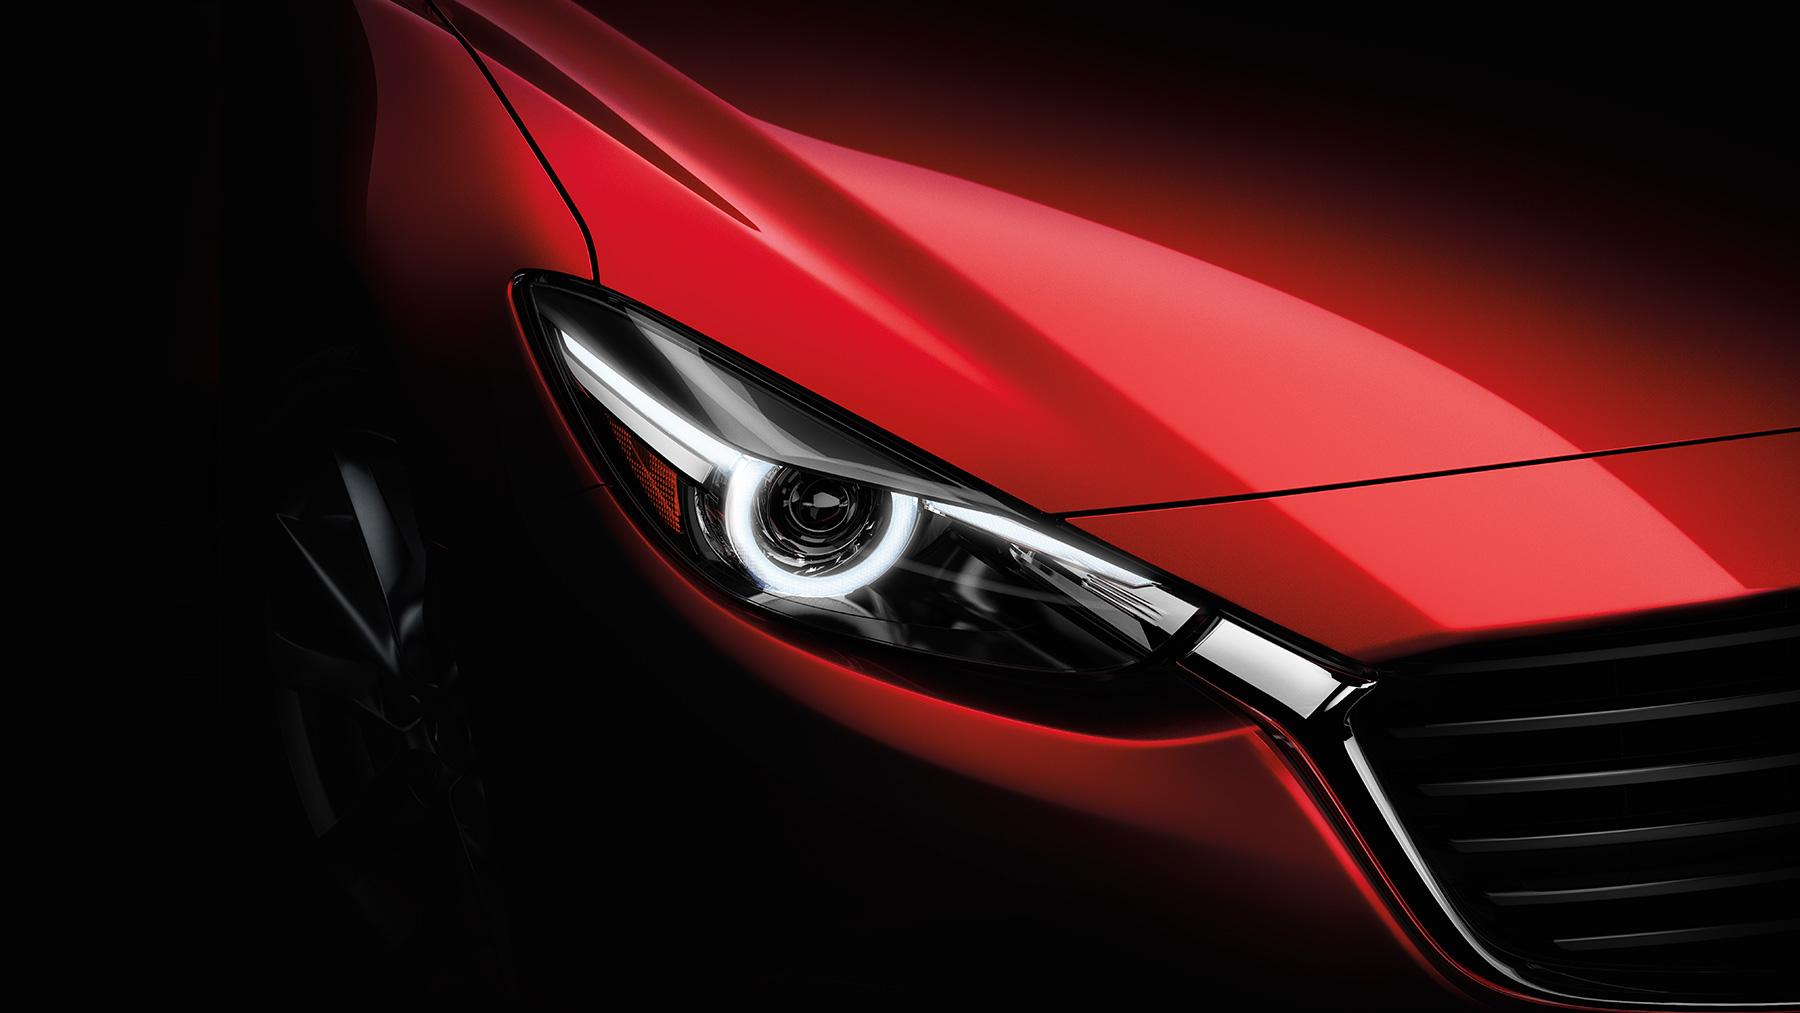 Edmunds True Value >> Mazda Build Price Your Vehicle Mazda Usa | Upcomingcarshq.com